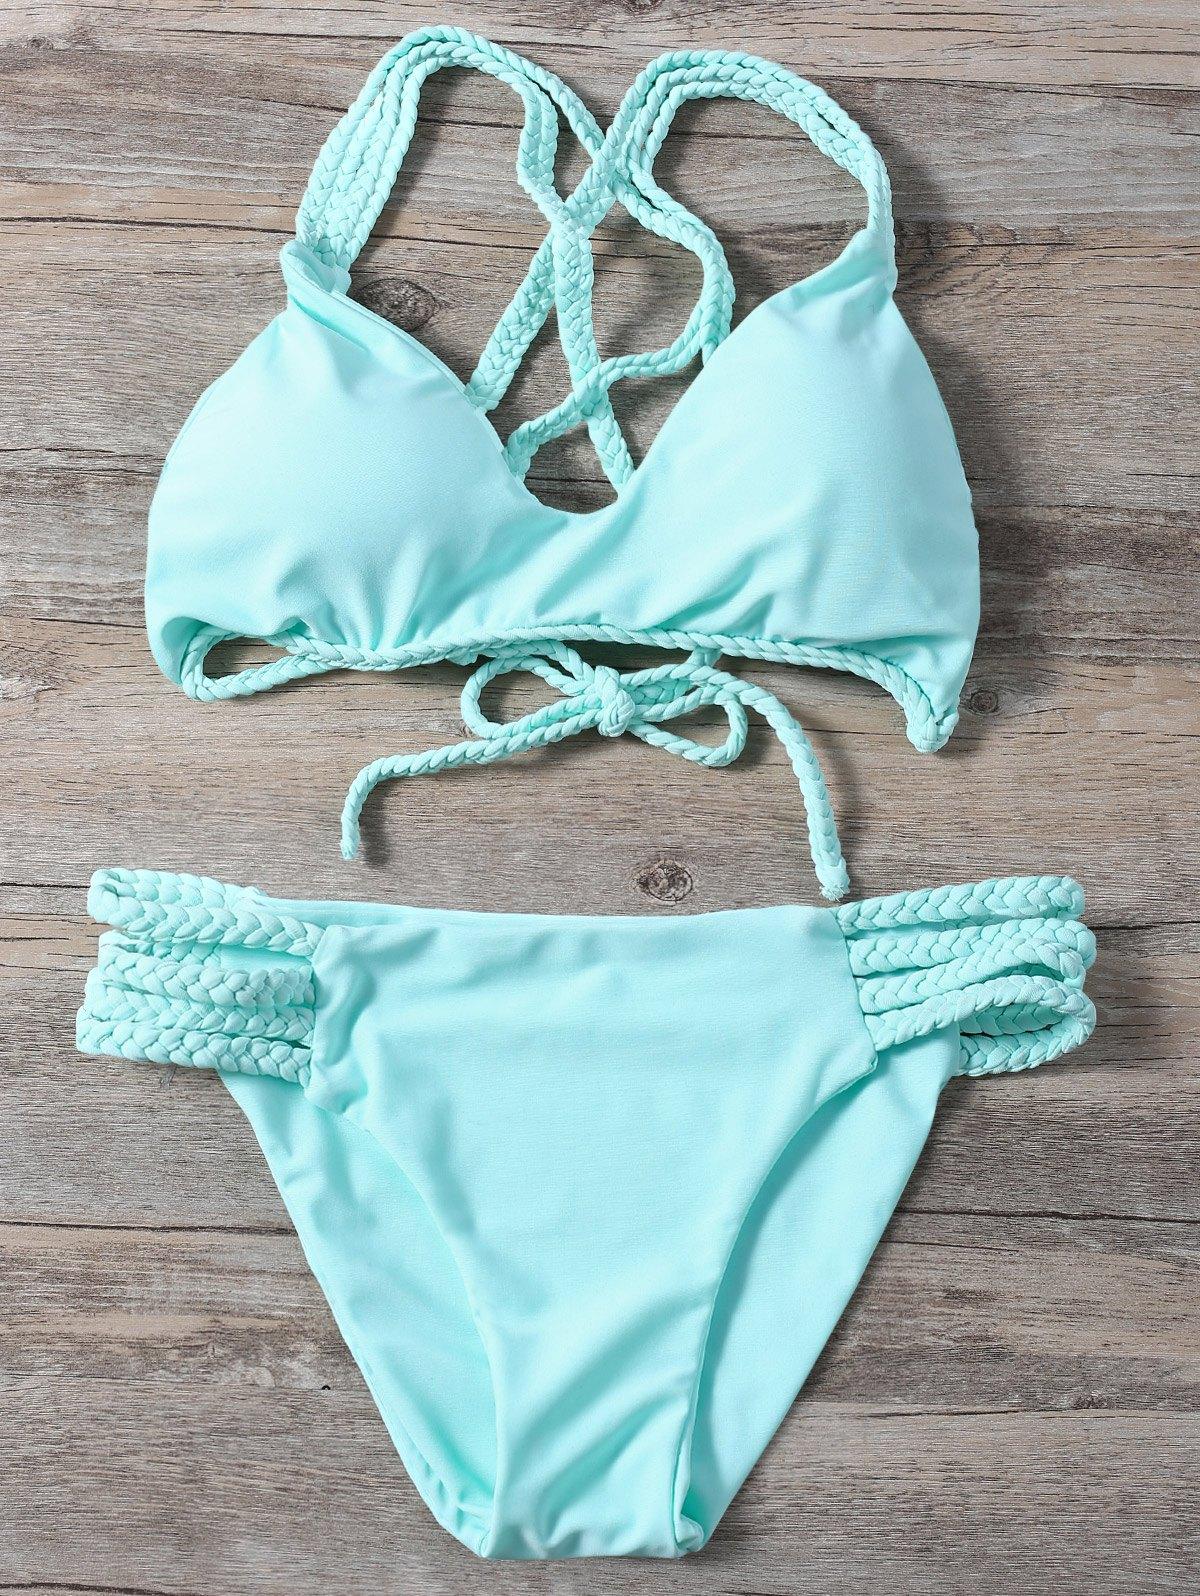 Braided Crisscross Strappy Bikini